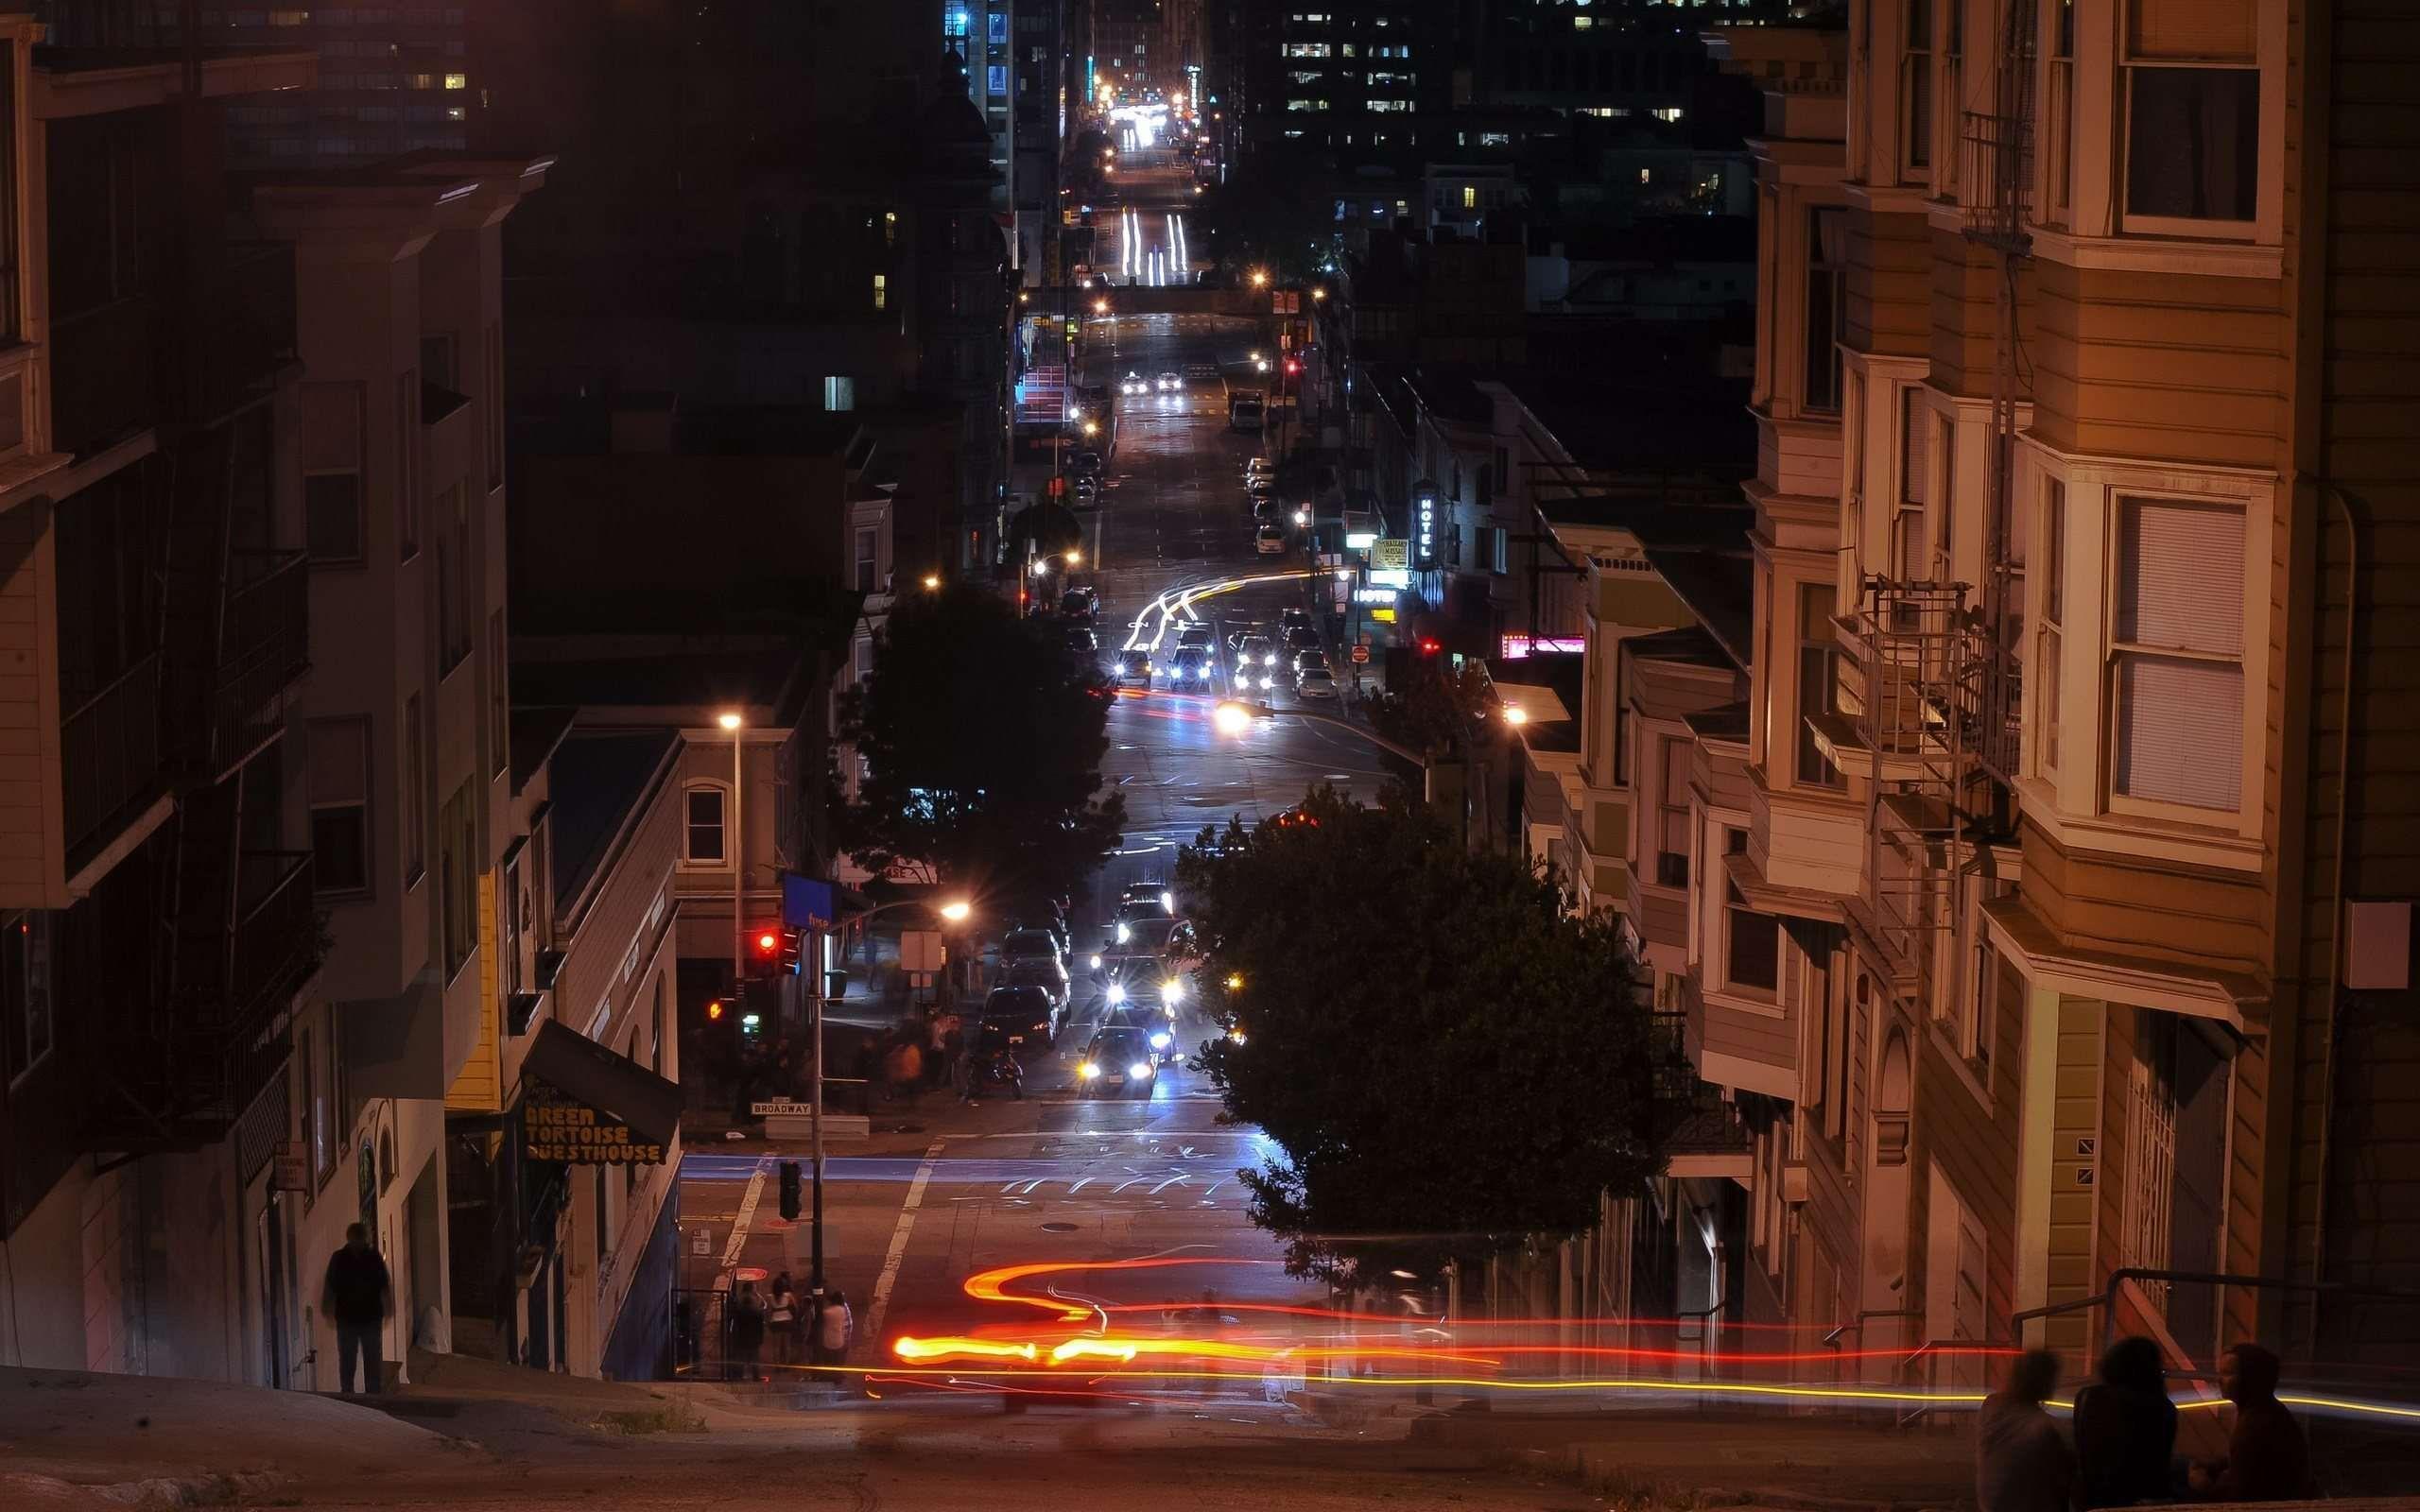 San Francisco Night Widescreen Wallpaper /41